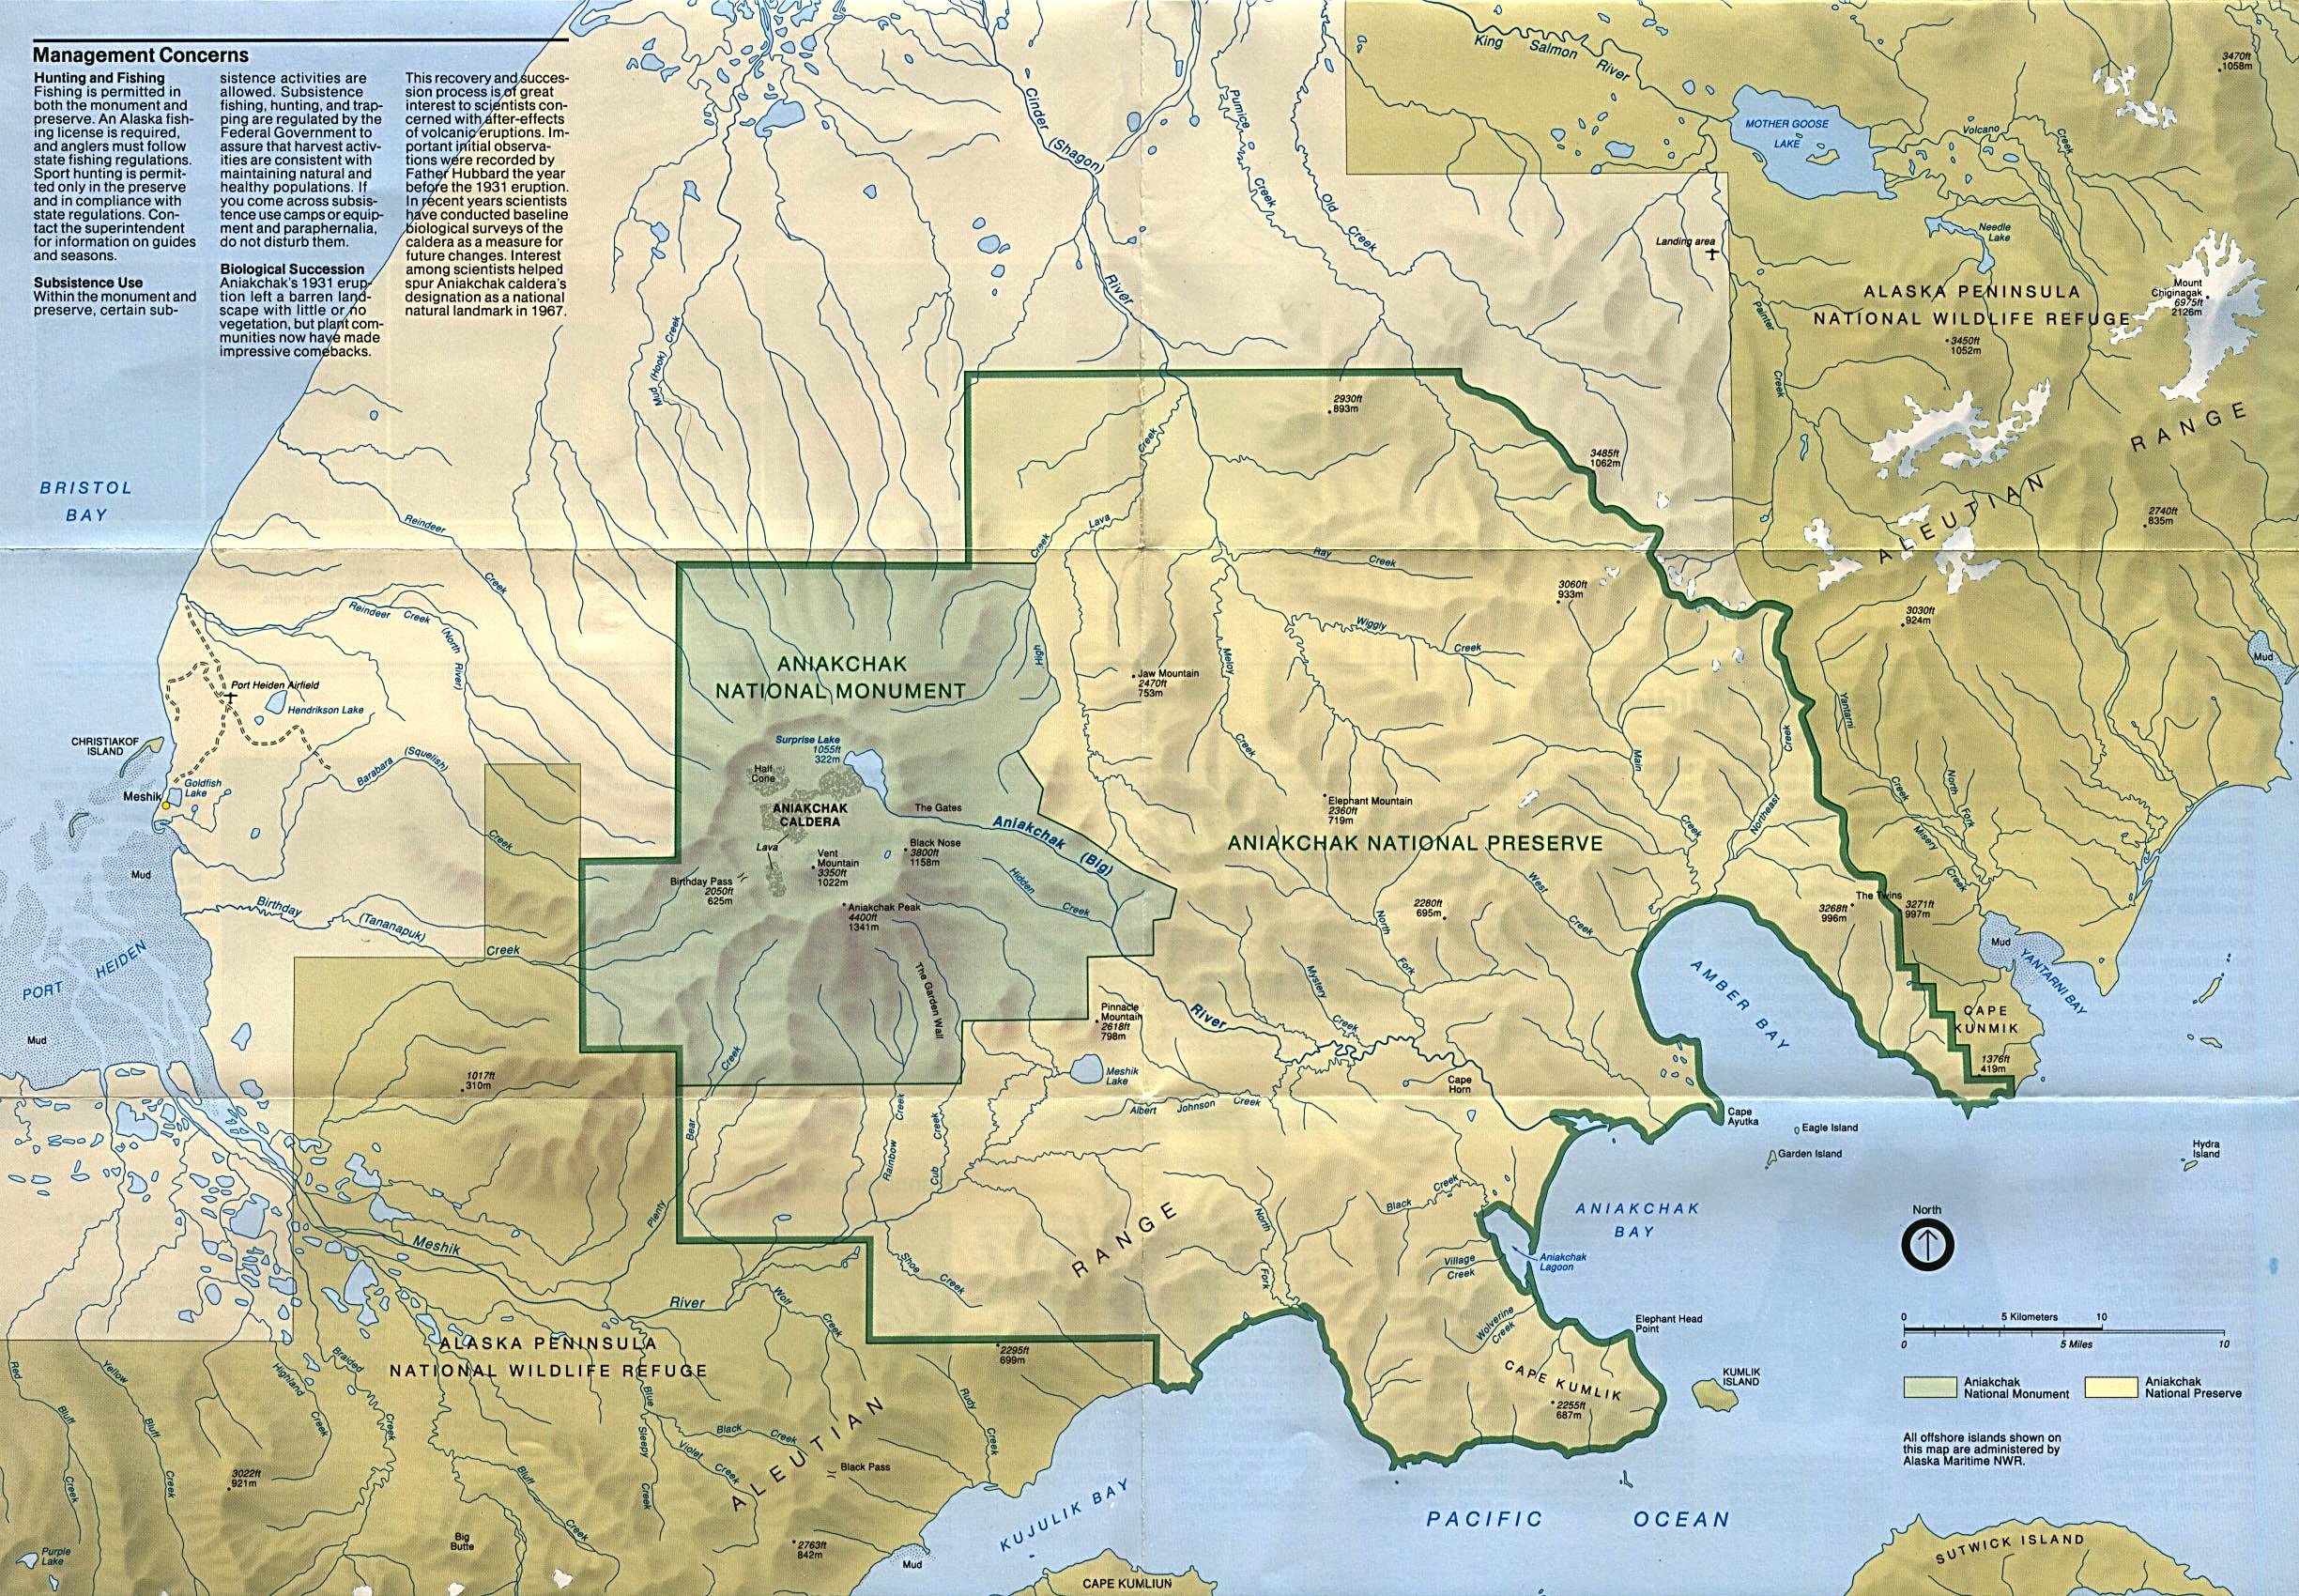 Park Map of Aniakchak National Monument and Preserve, Alaska, United States